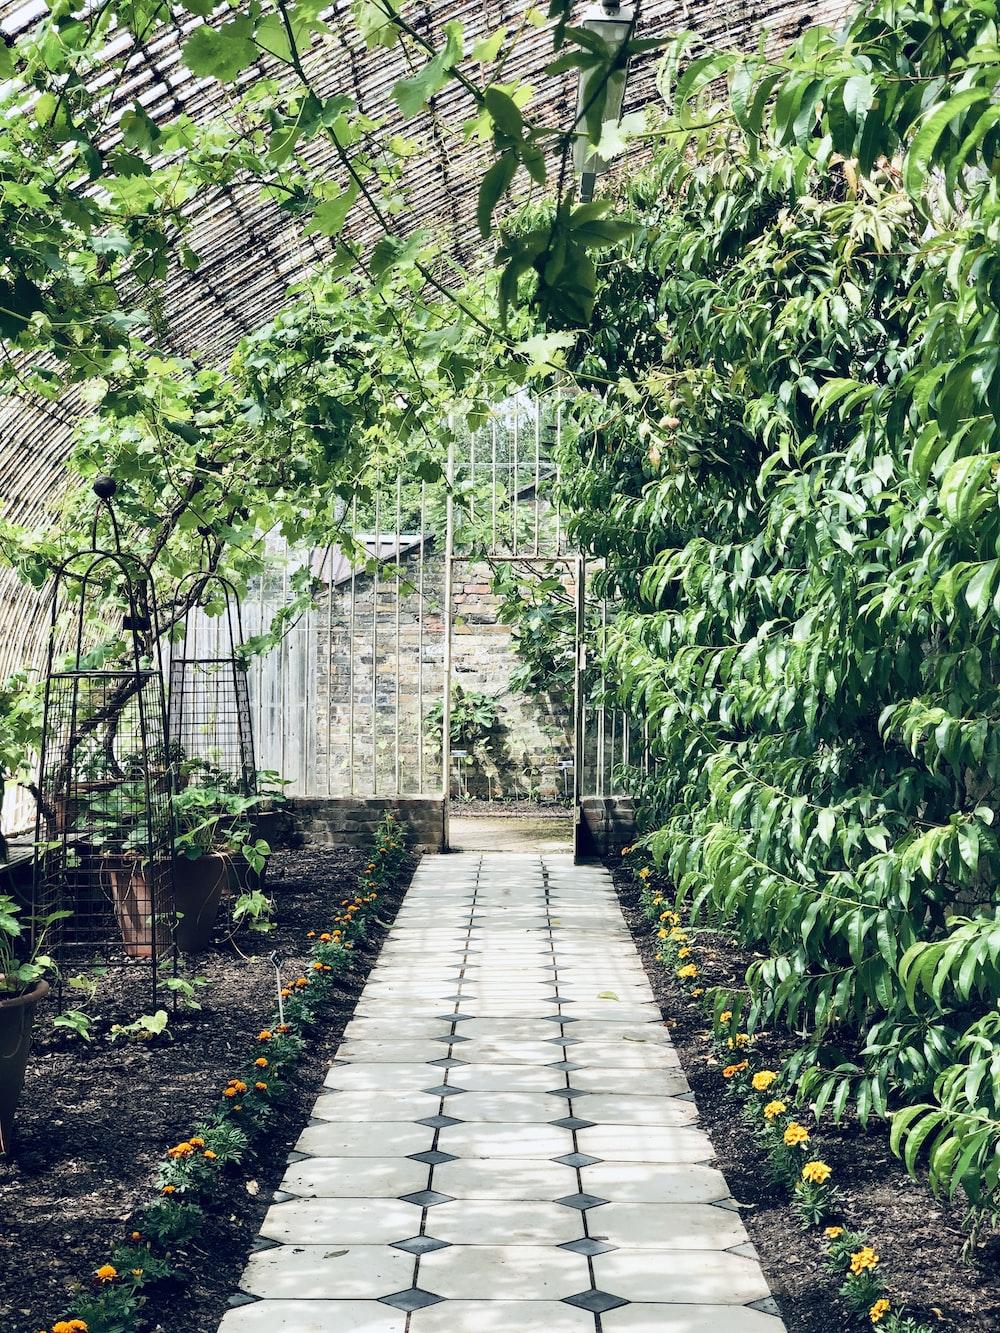 green plants on gray concrete pathway